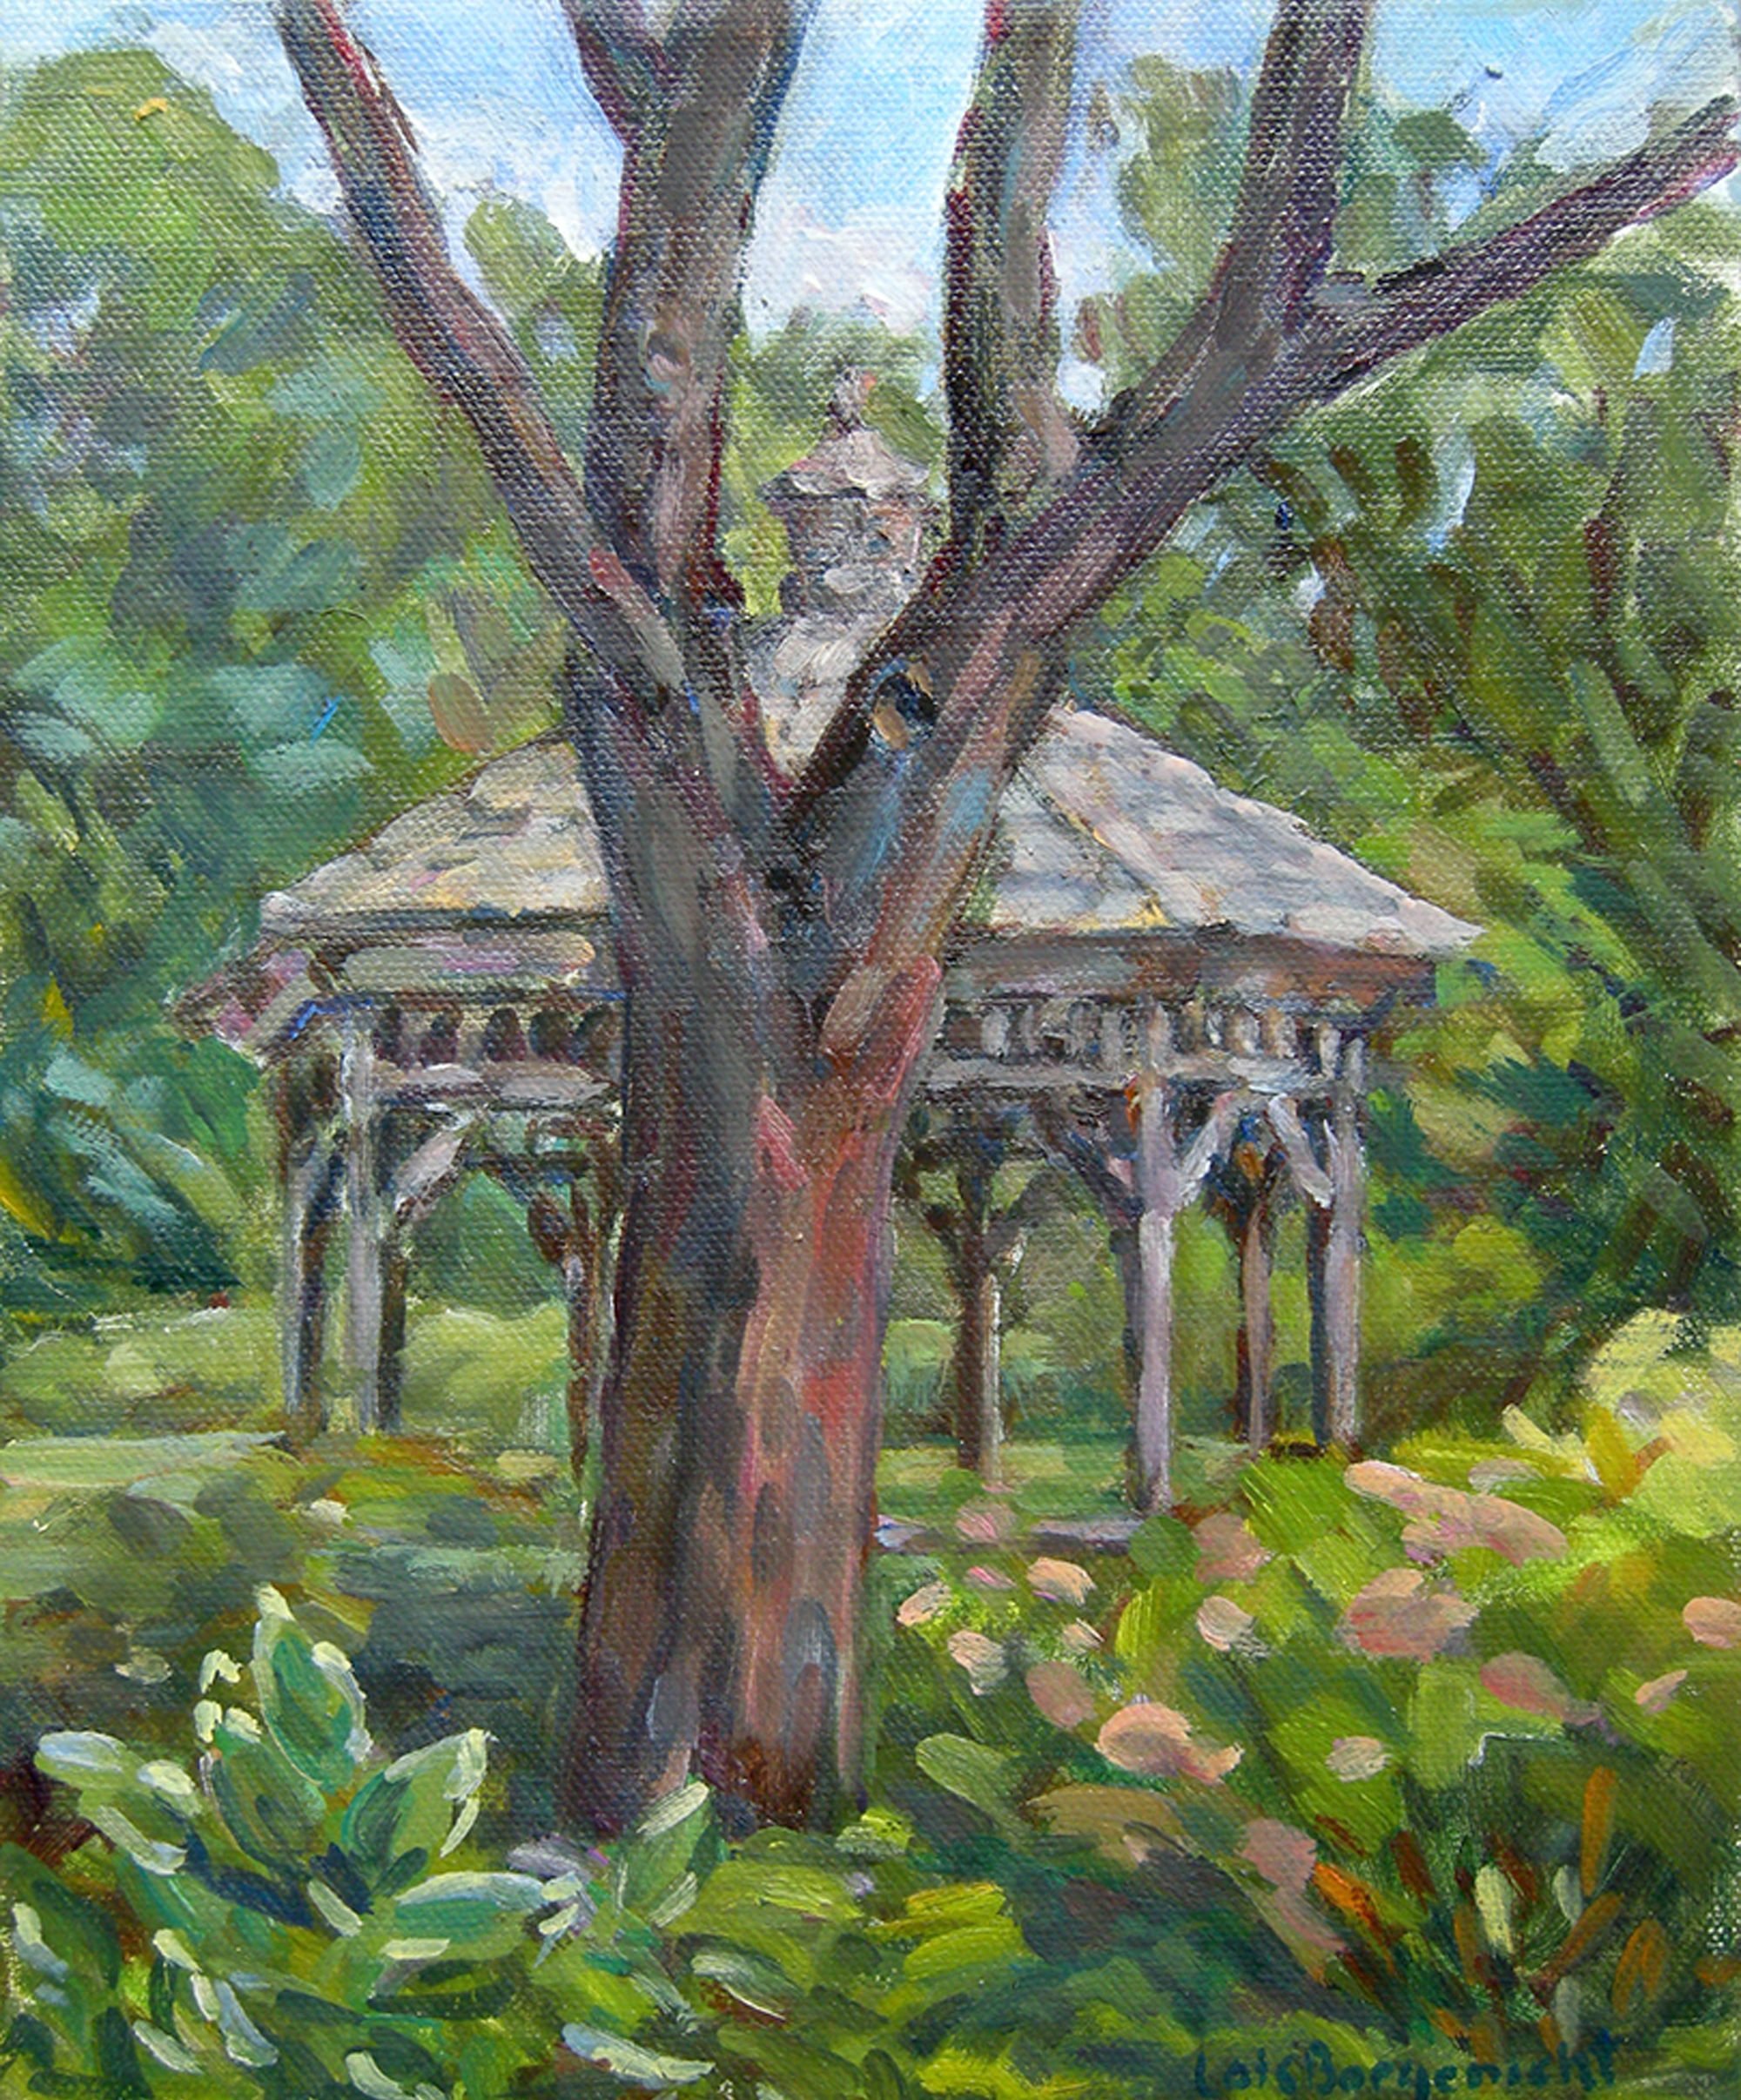 Cylburn Gazebo, oil on canvas, 10